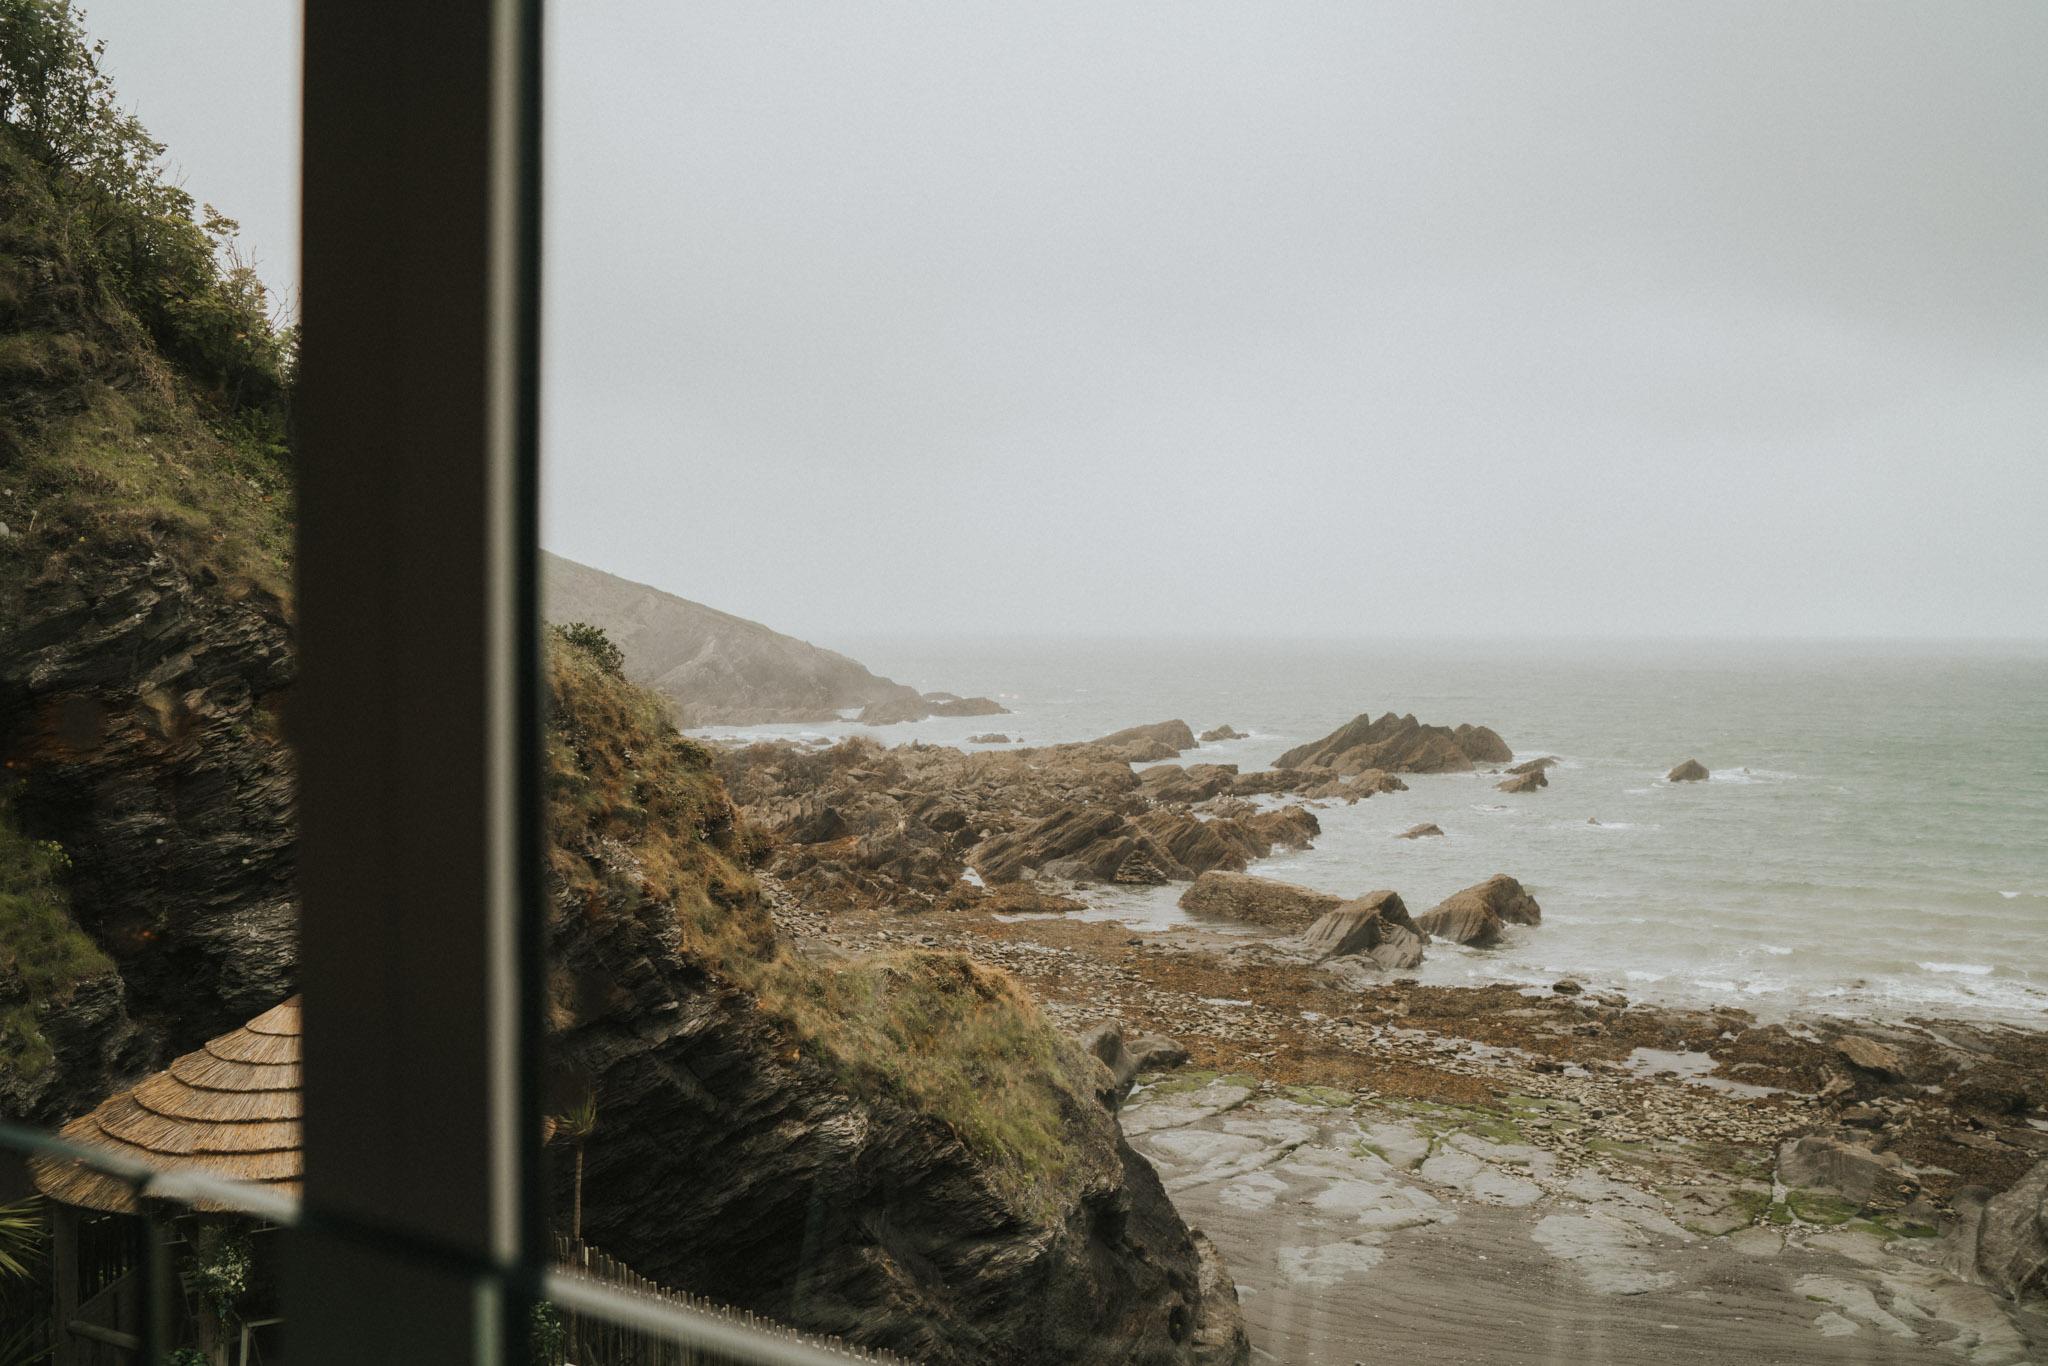 John-Amy-Tunnels-Beaches-Ilfracombe-Devon-Outdoor-Wedding-UK-Colchester-Essex-Alternative-Wedding-Photographer-Grace-Elizabeth (5 of 31).jpg